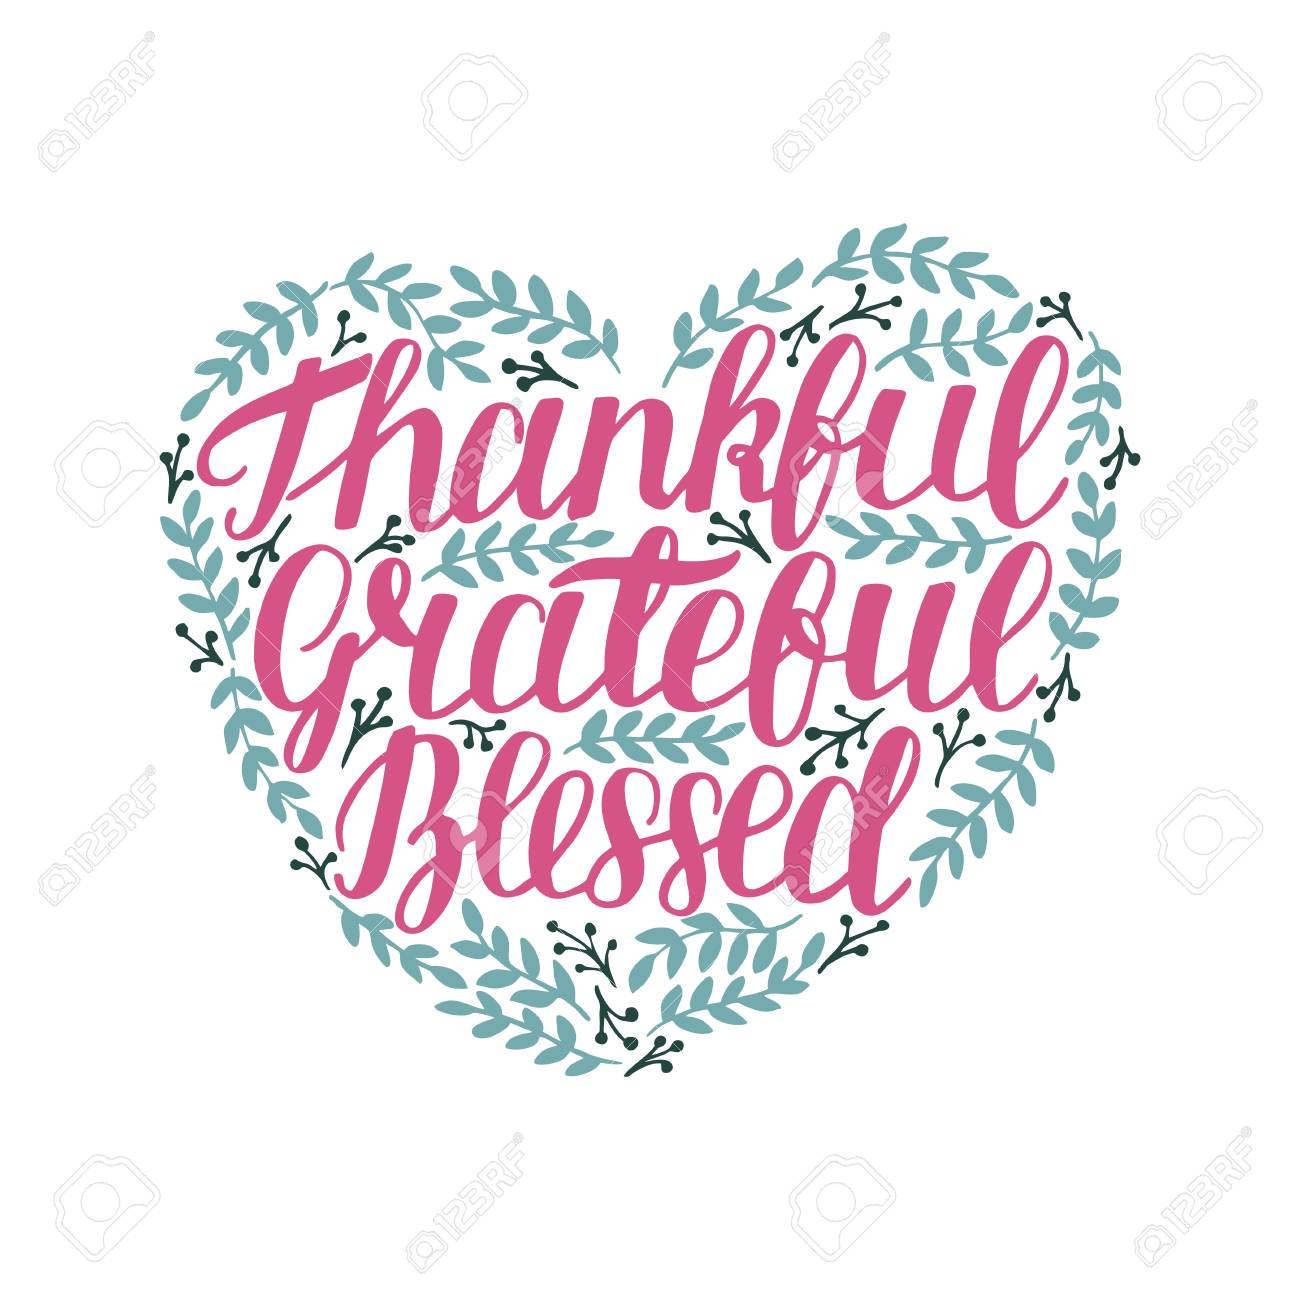 Scripture about grateful heart